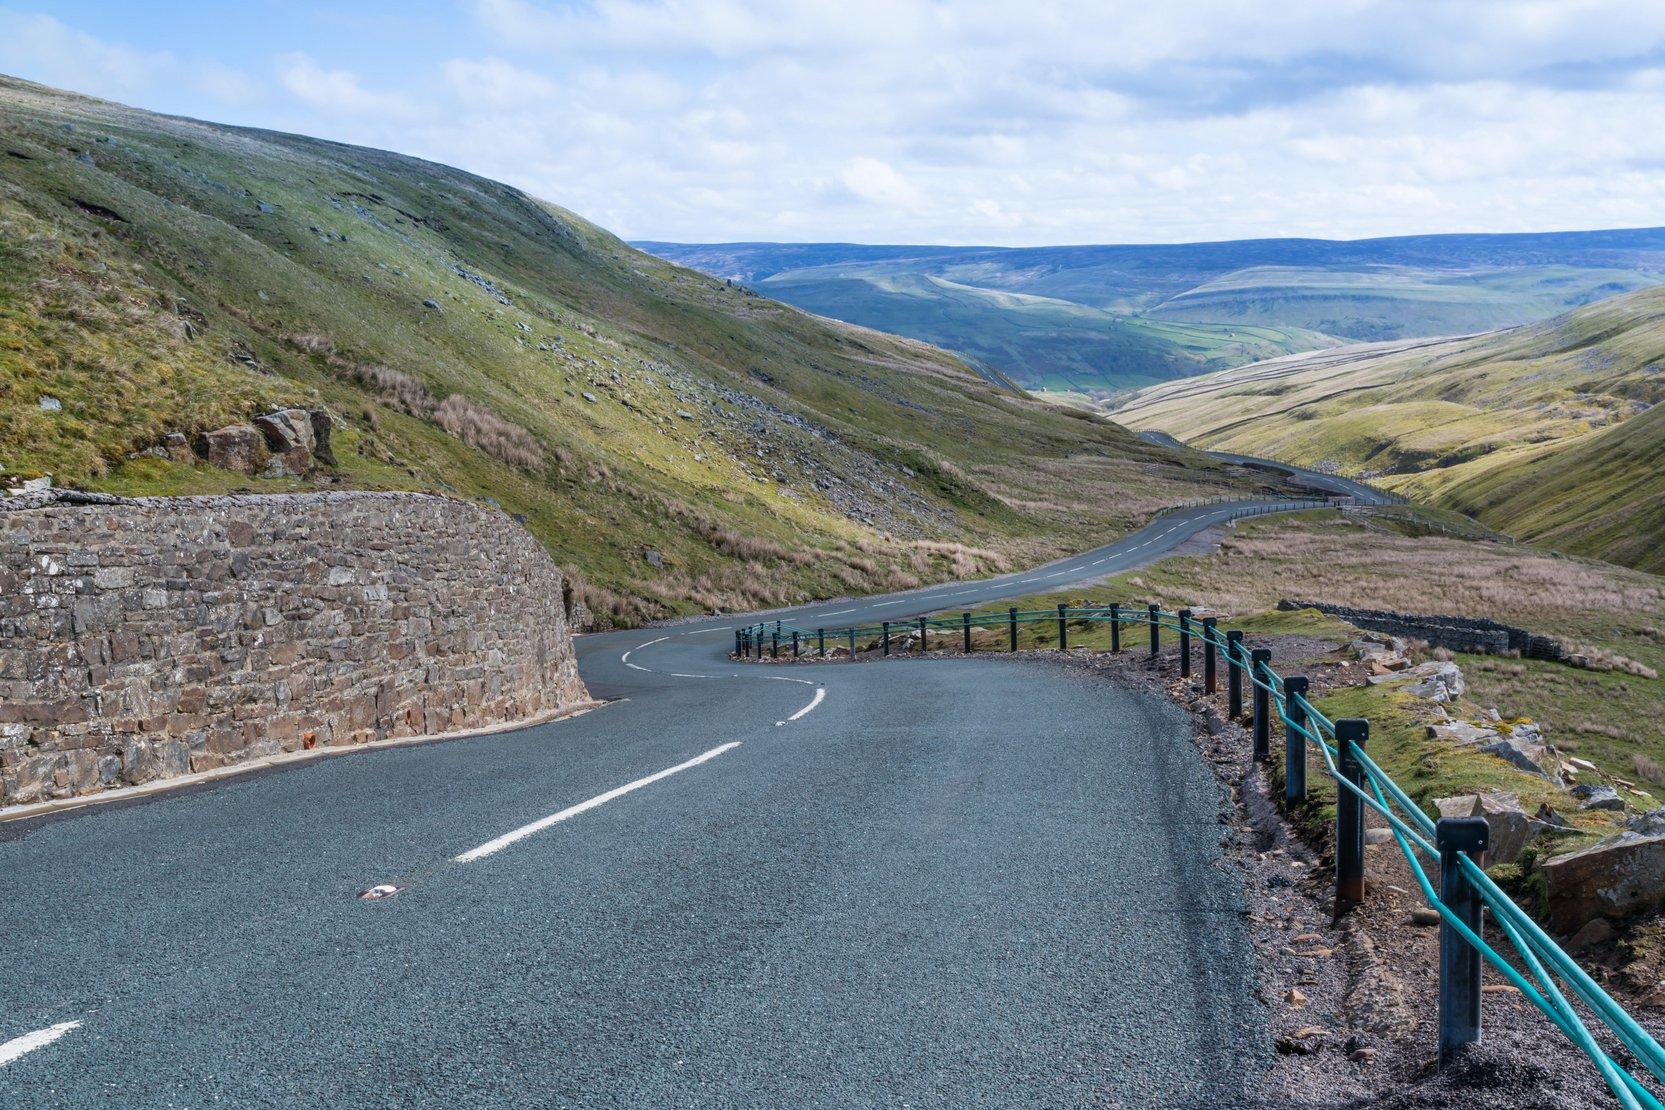 Scenic Drives UK - Buttertub Pass